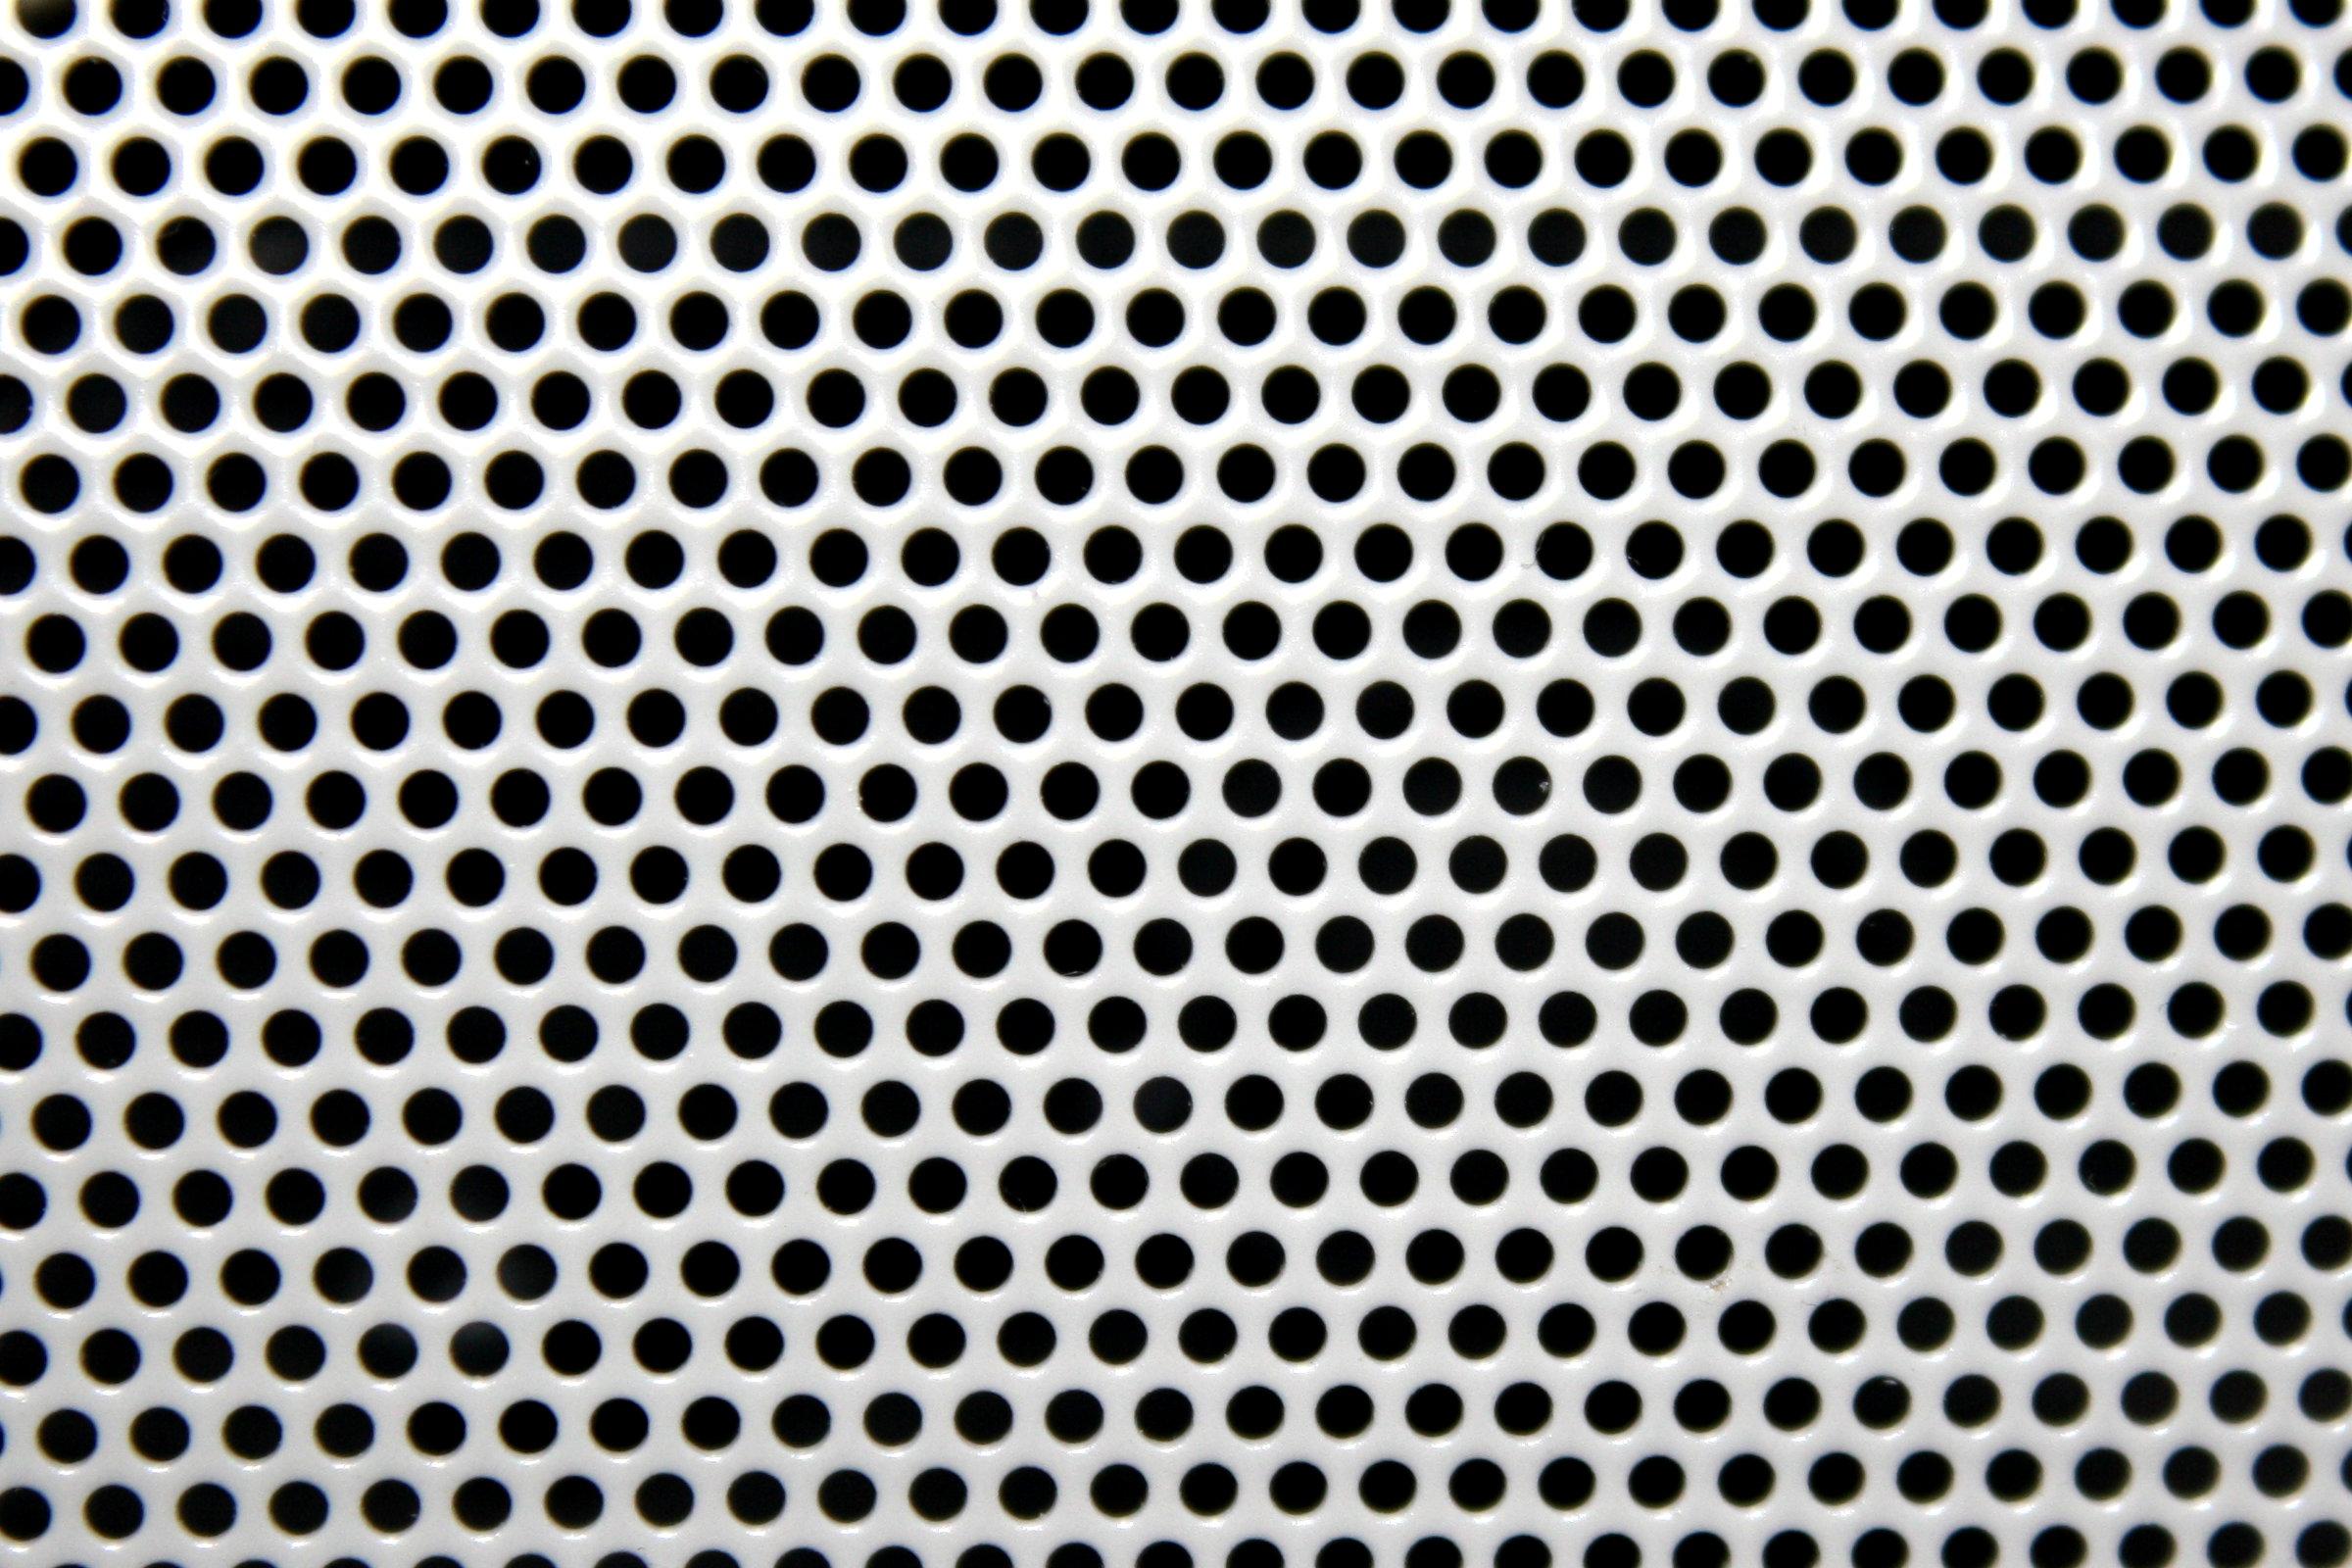 White Mesh With Round Holes Texture Photos Public Domain